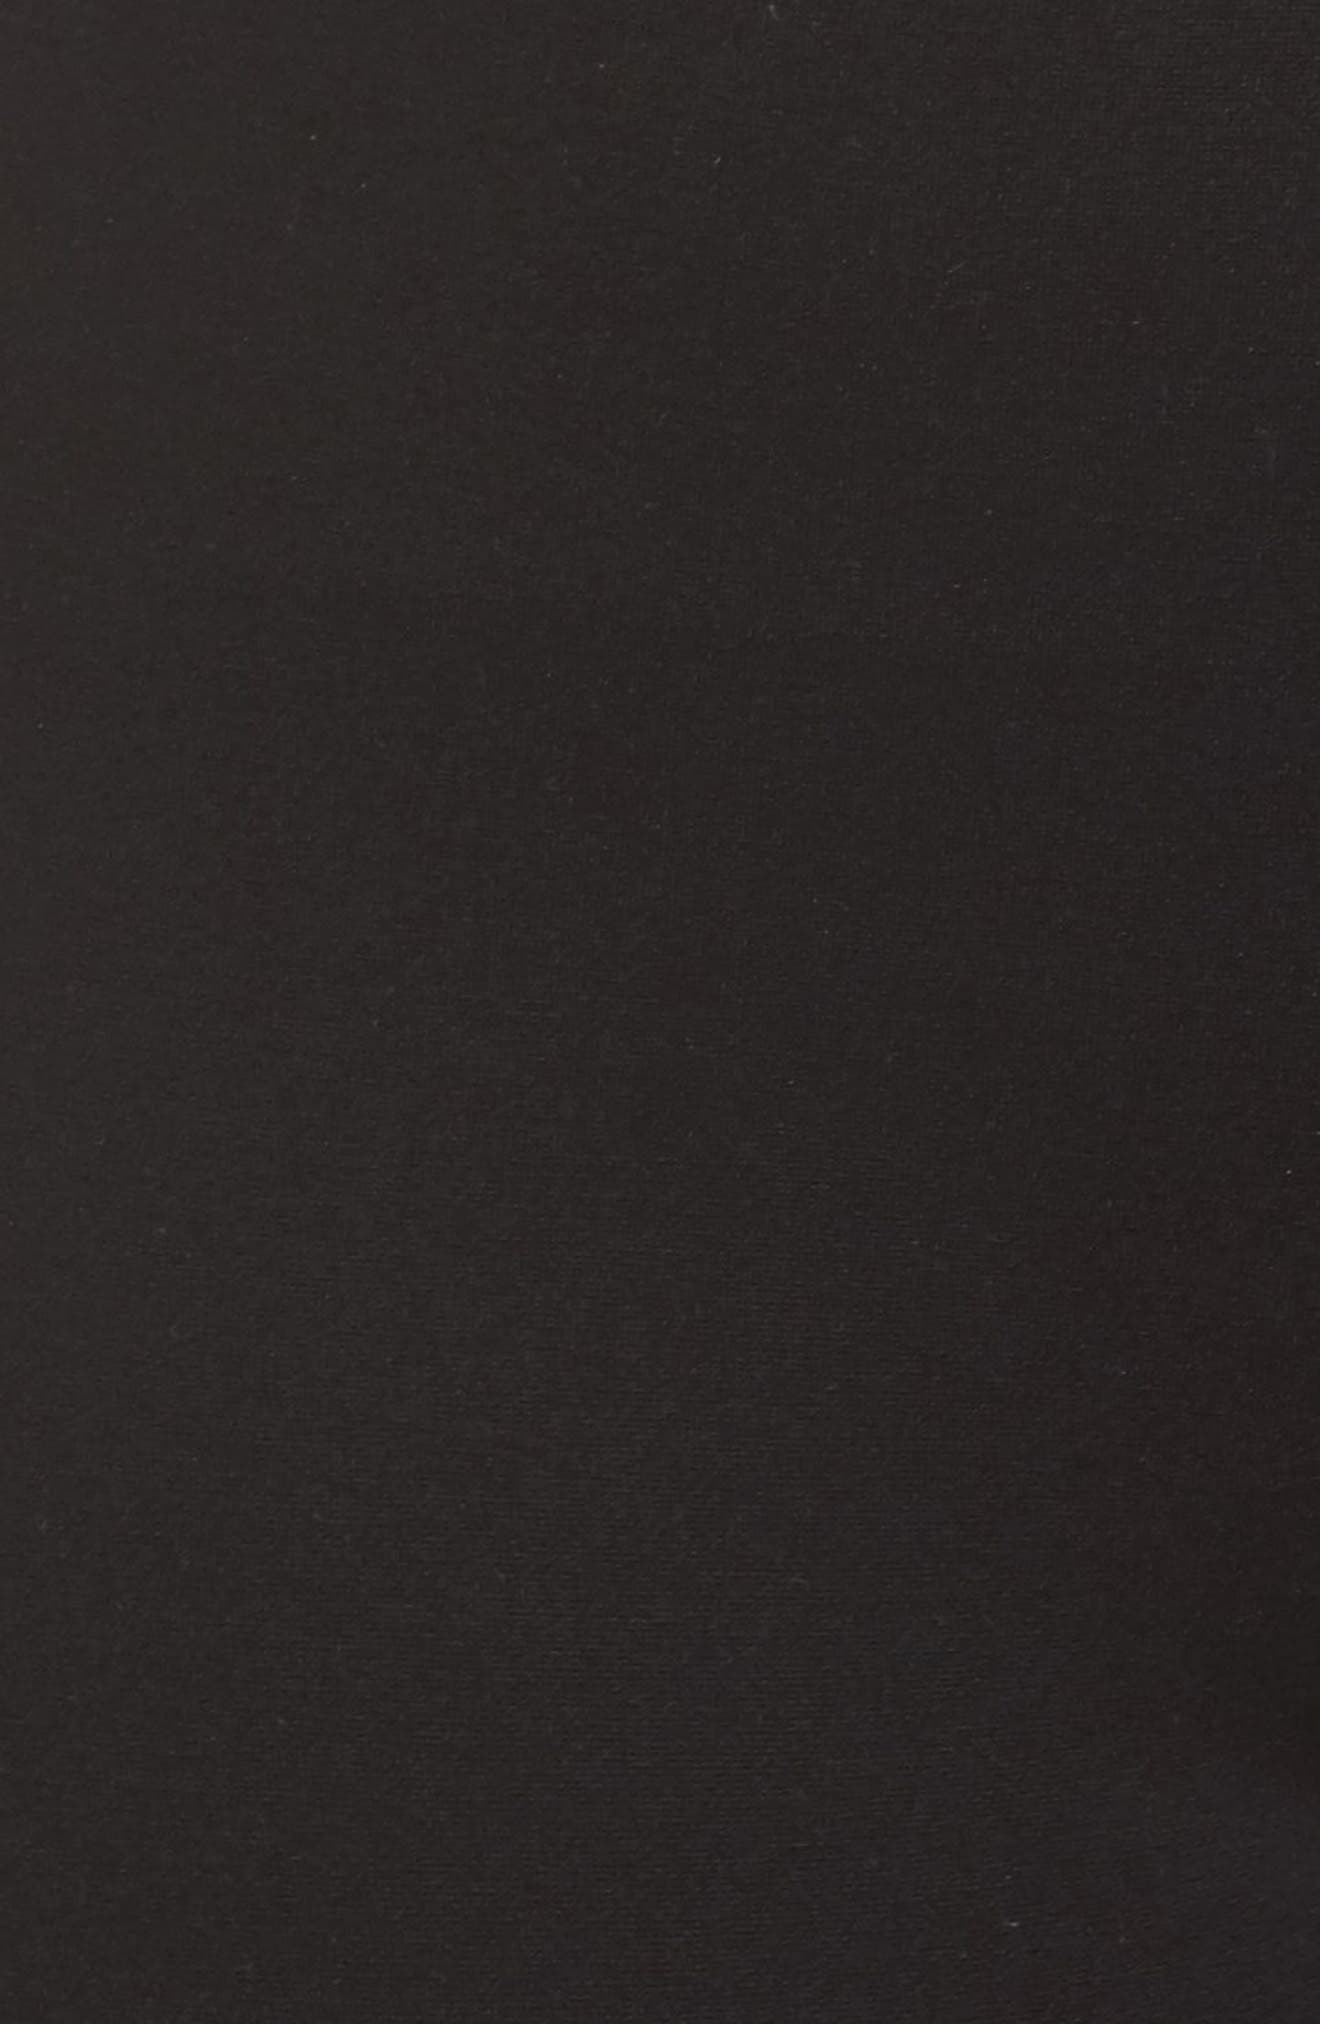 Mara Seamed Ponte Leggings,                             Alternate thumbnail 7, color,                             Black